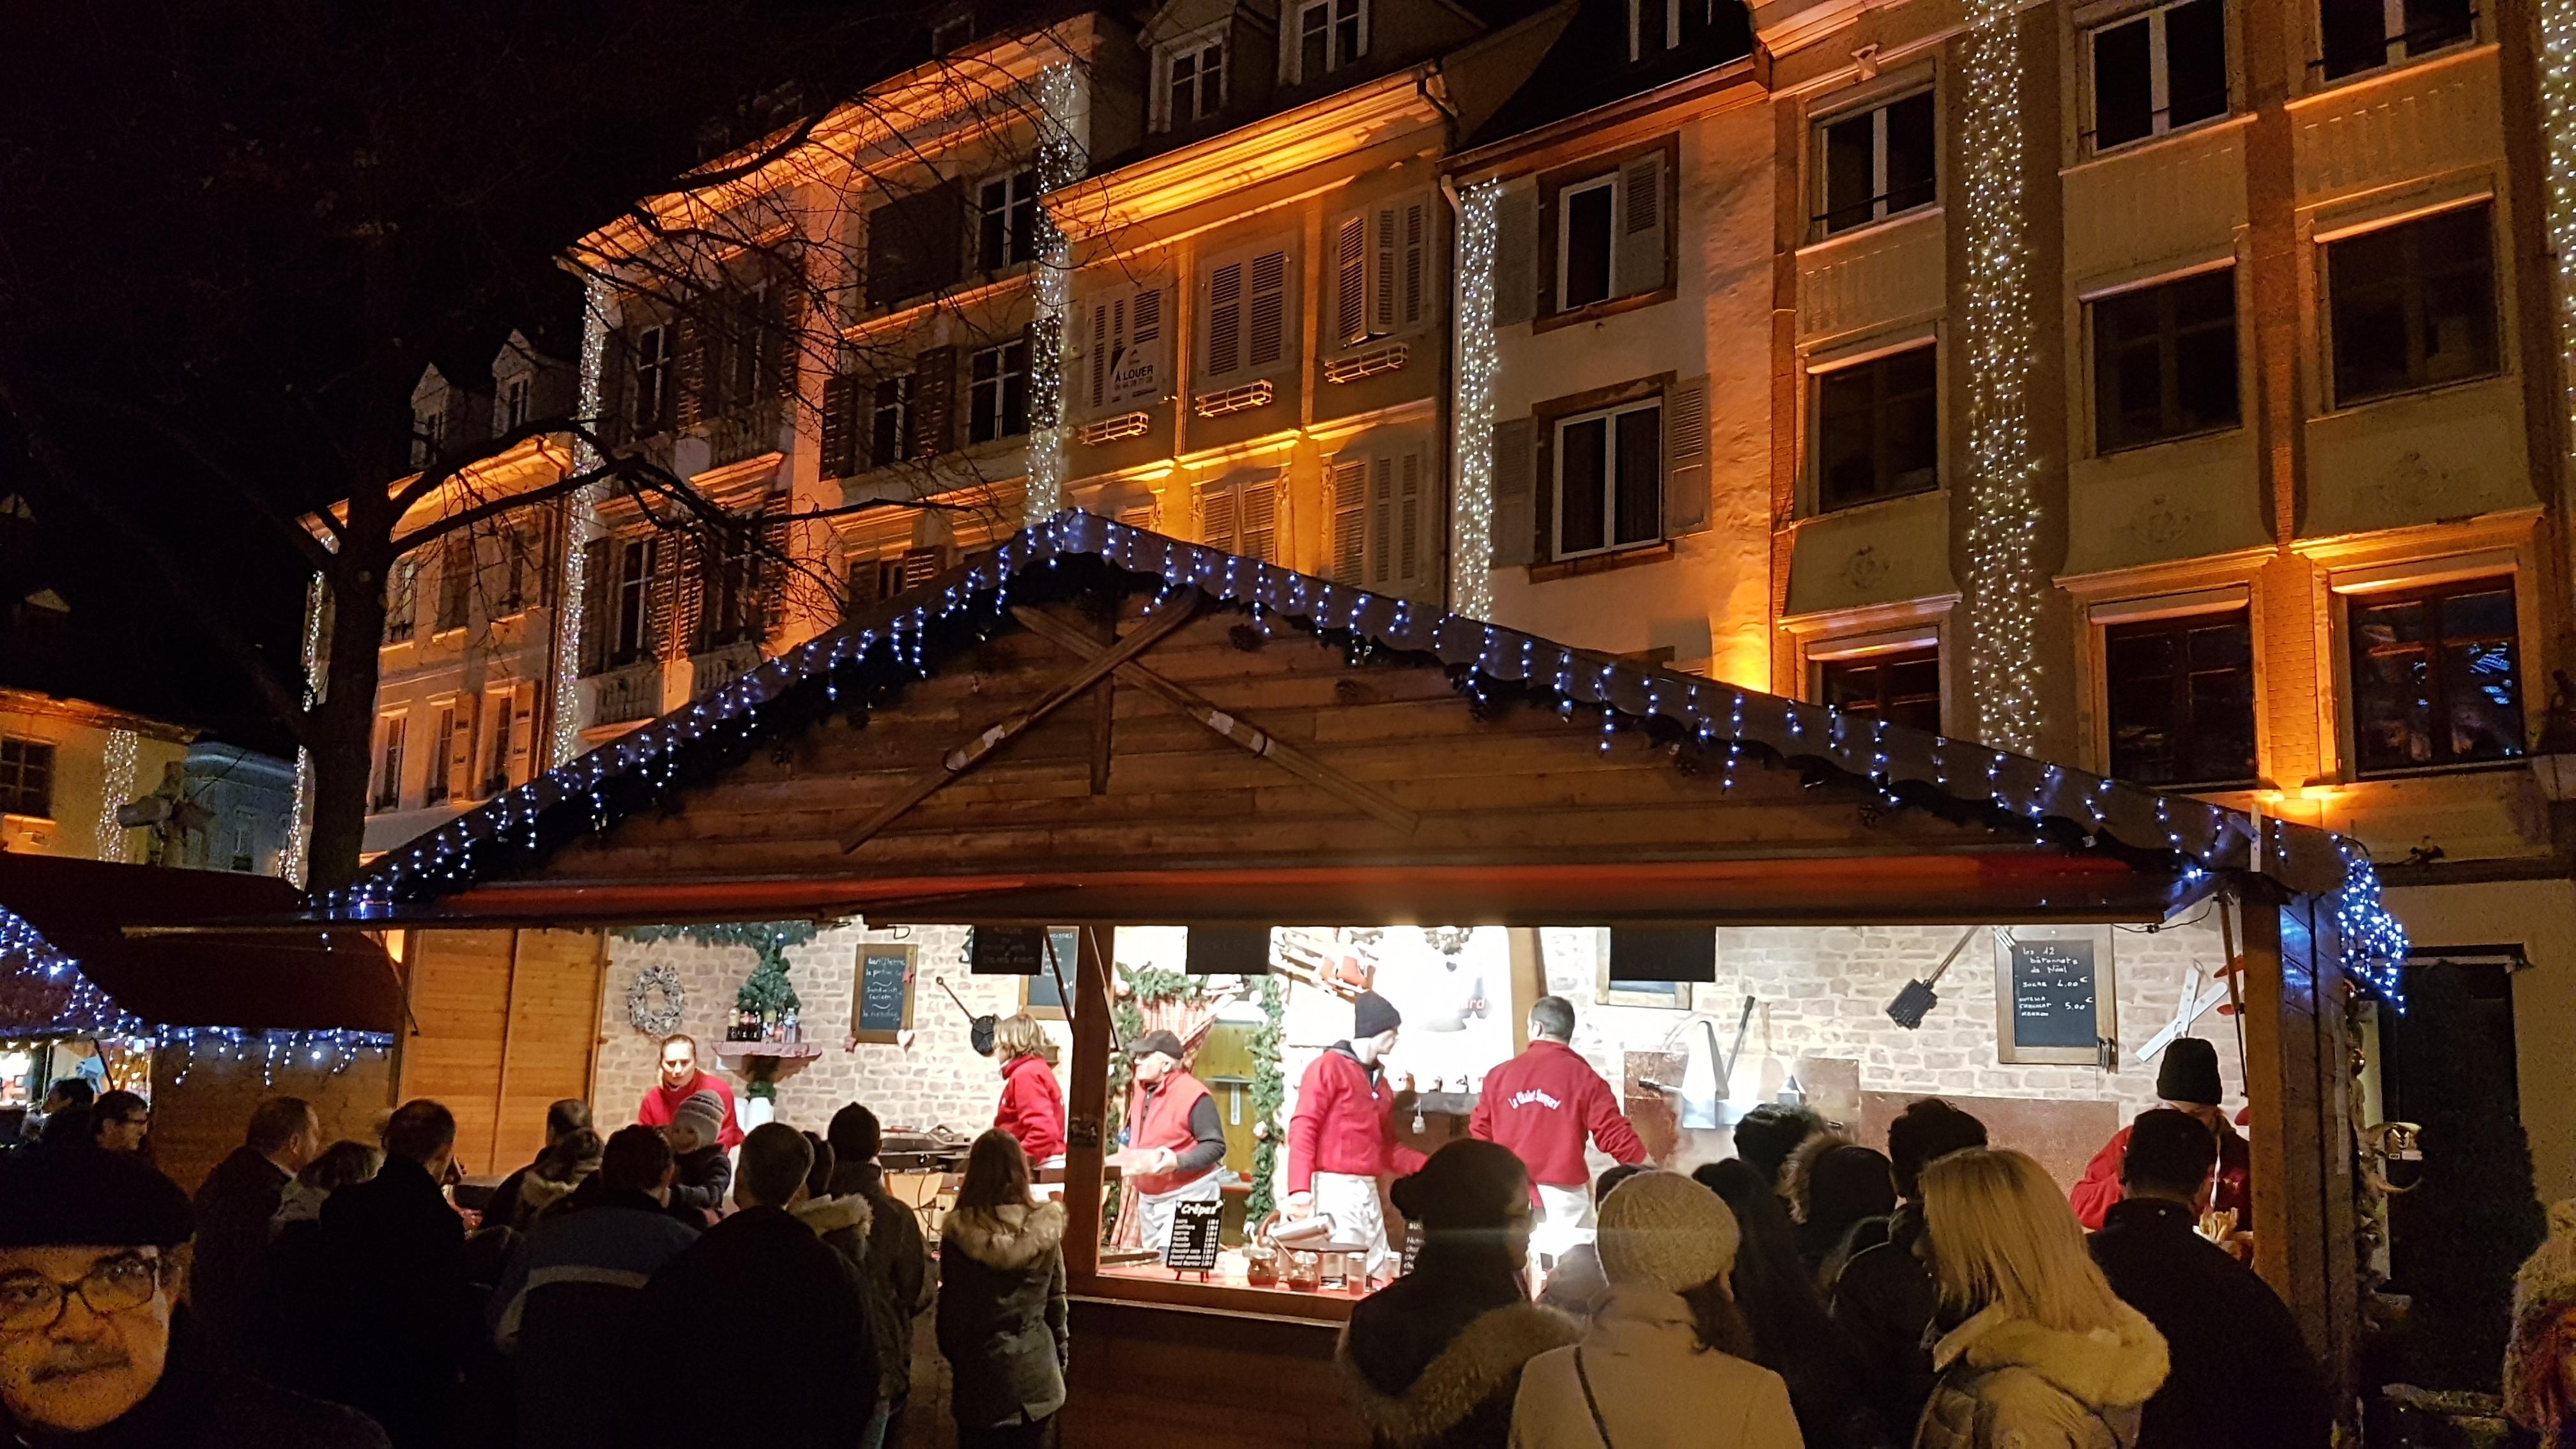 201712_CPS_Soirée Marché Noël_005